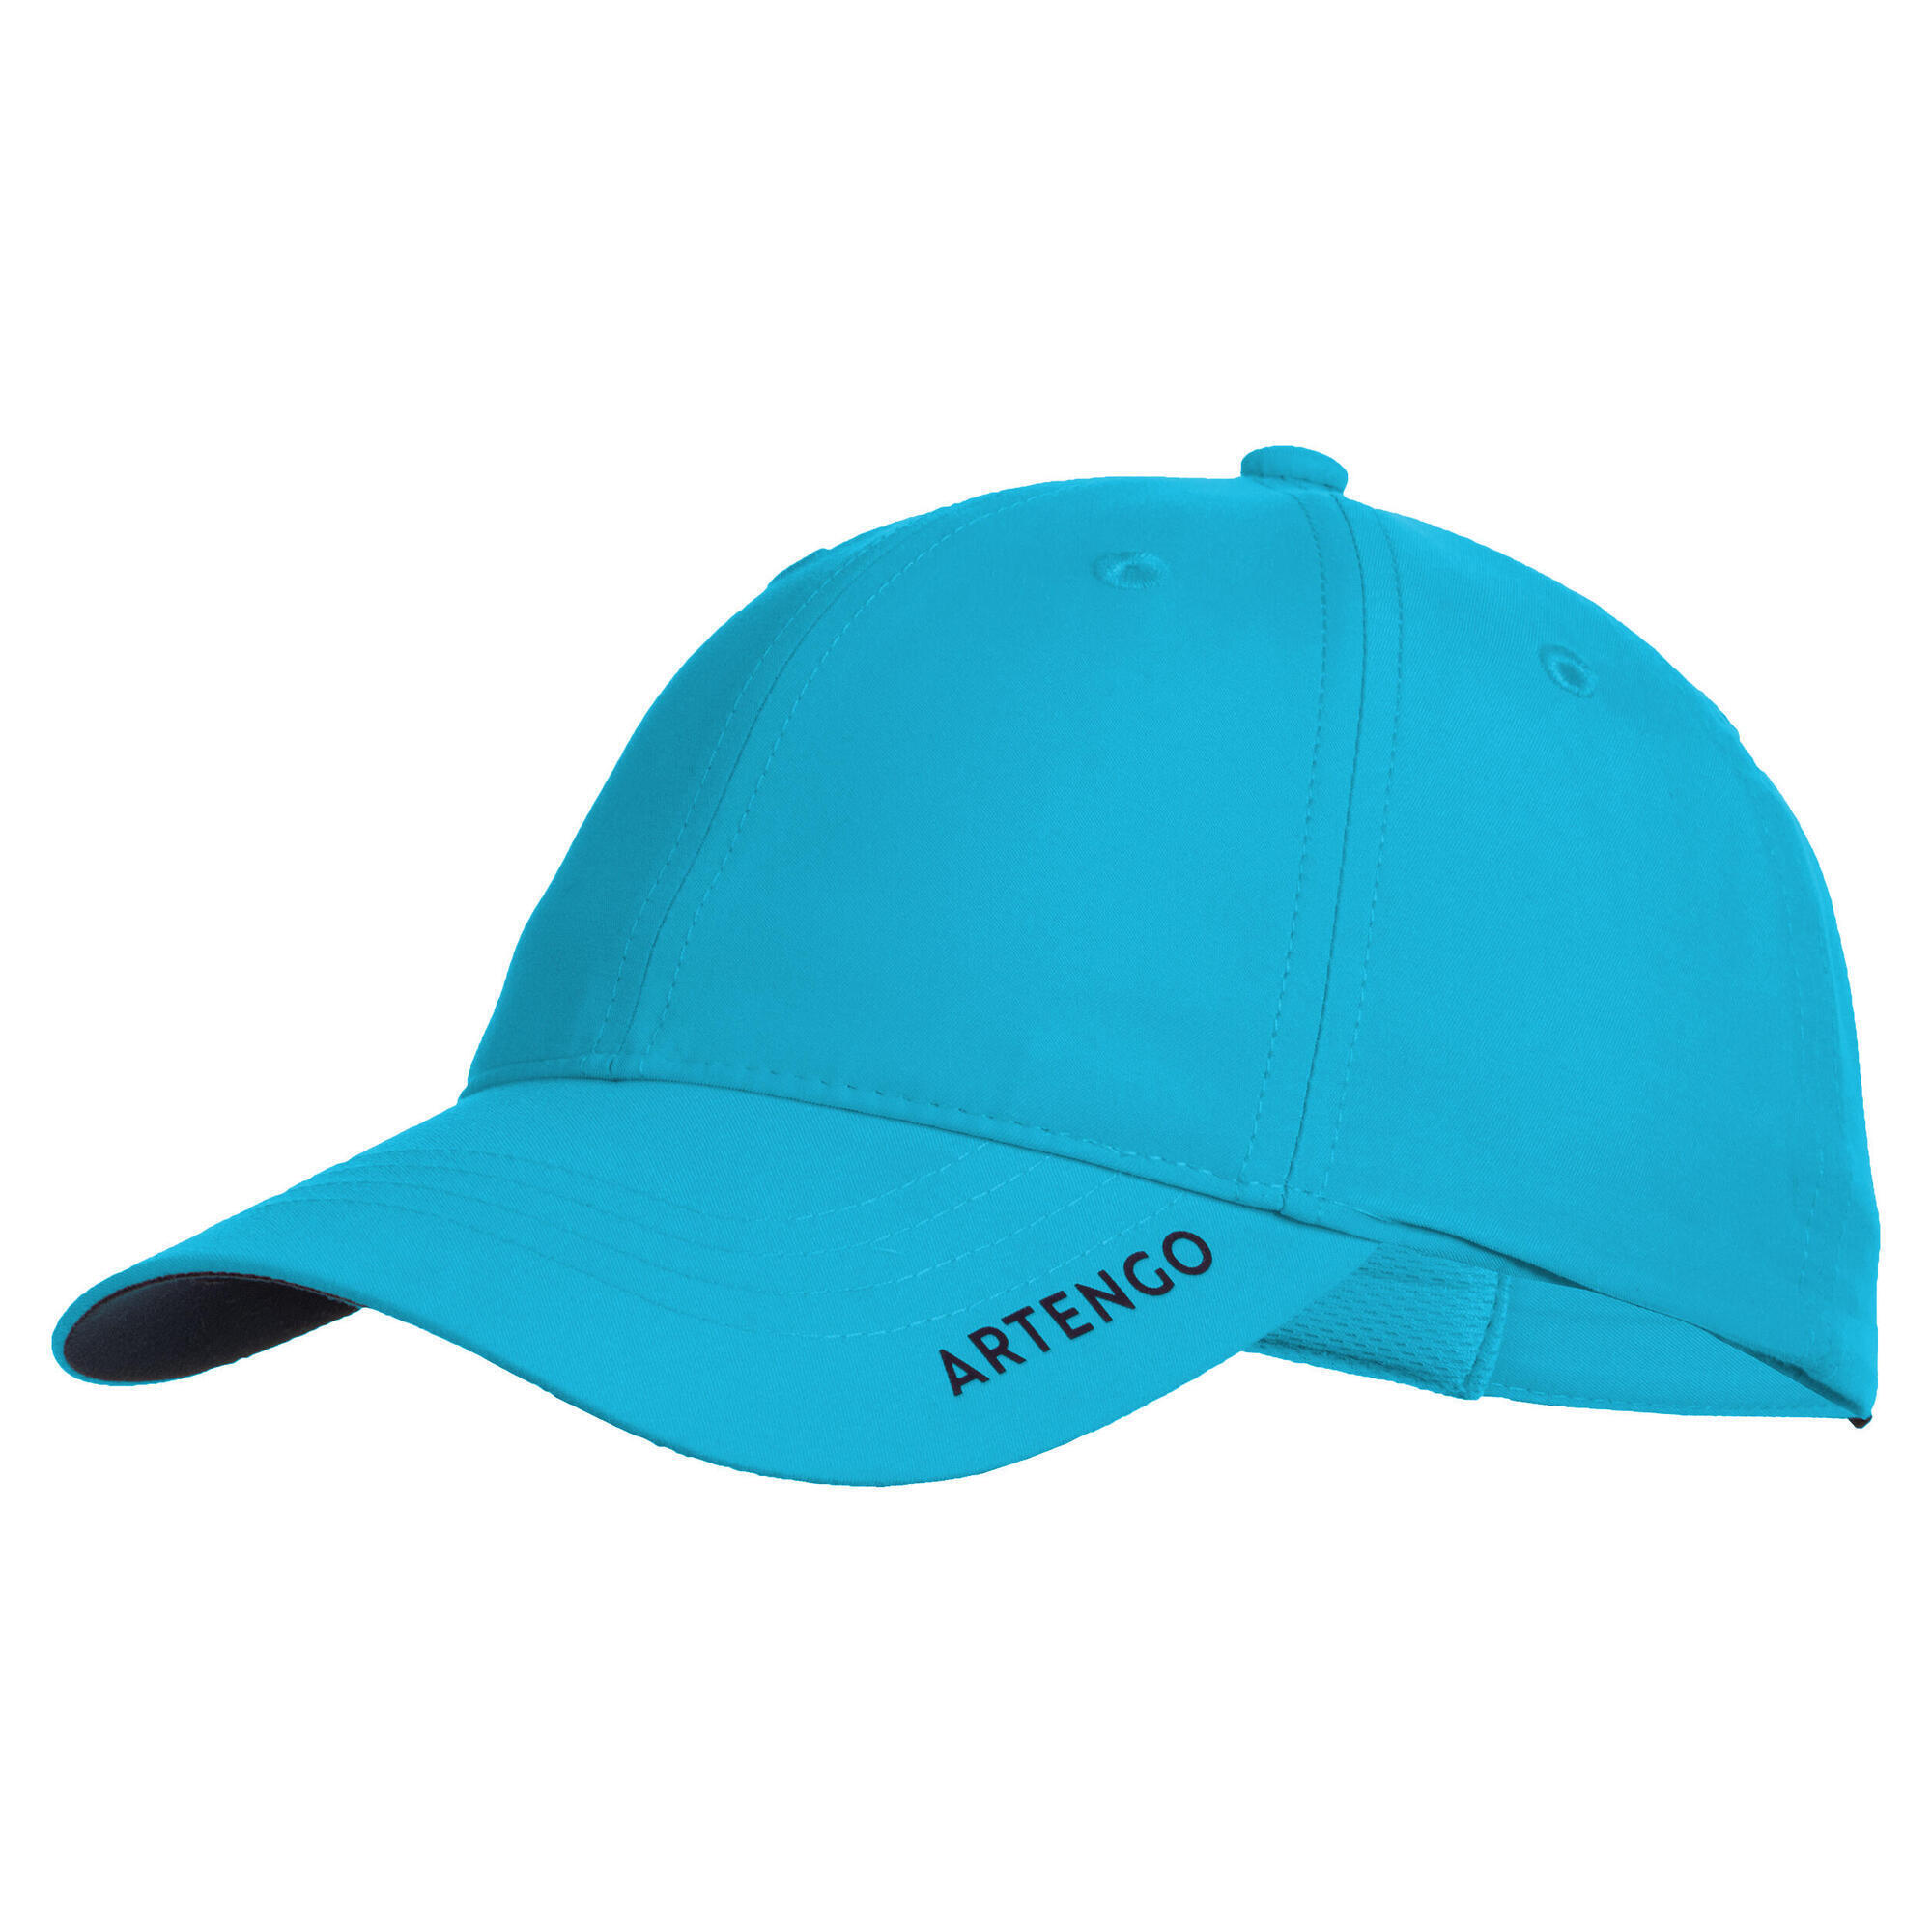 Schirmmütze Tennis-Cap TC 500 Gr. 54 türkis/blau